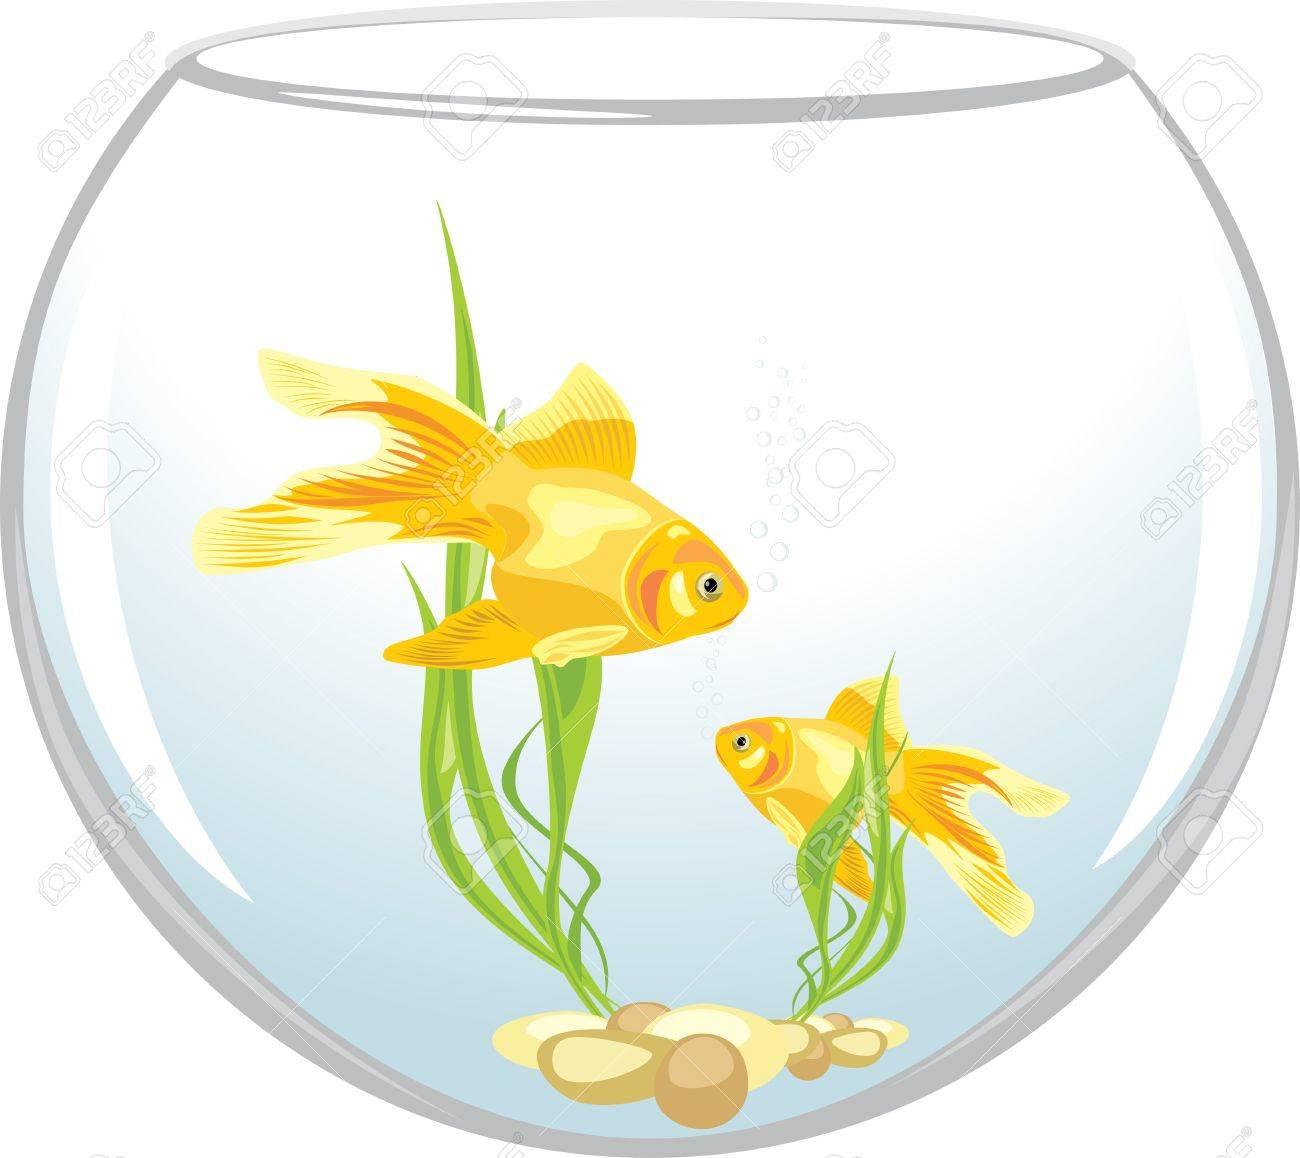 Goldfish clipart two. X free clip art